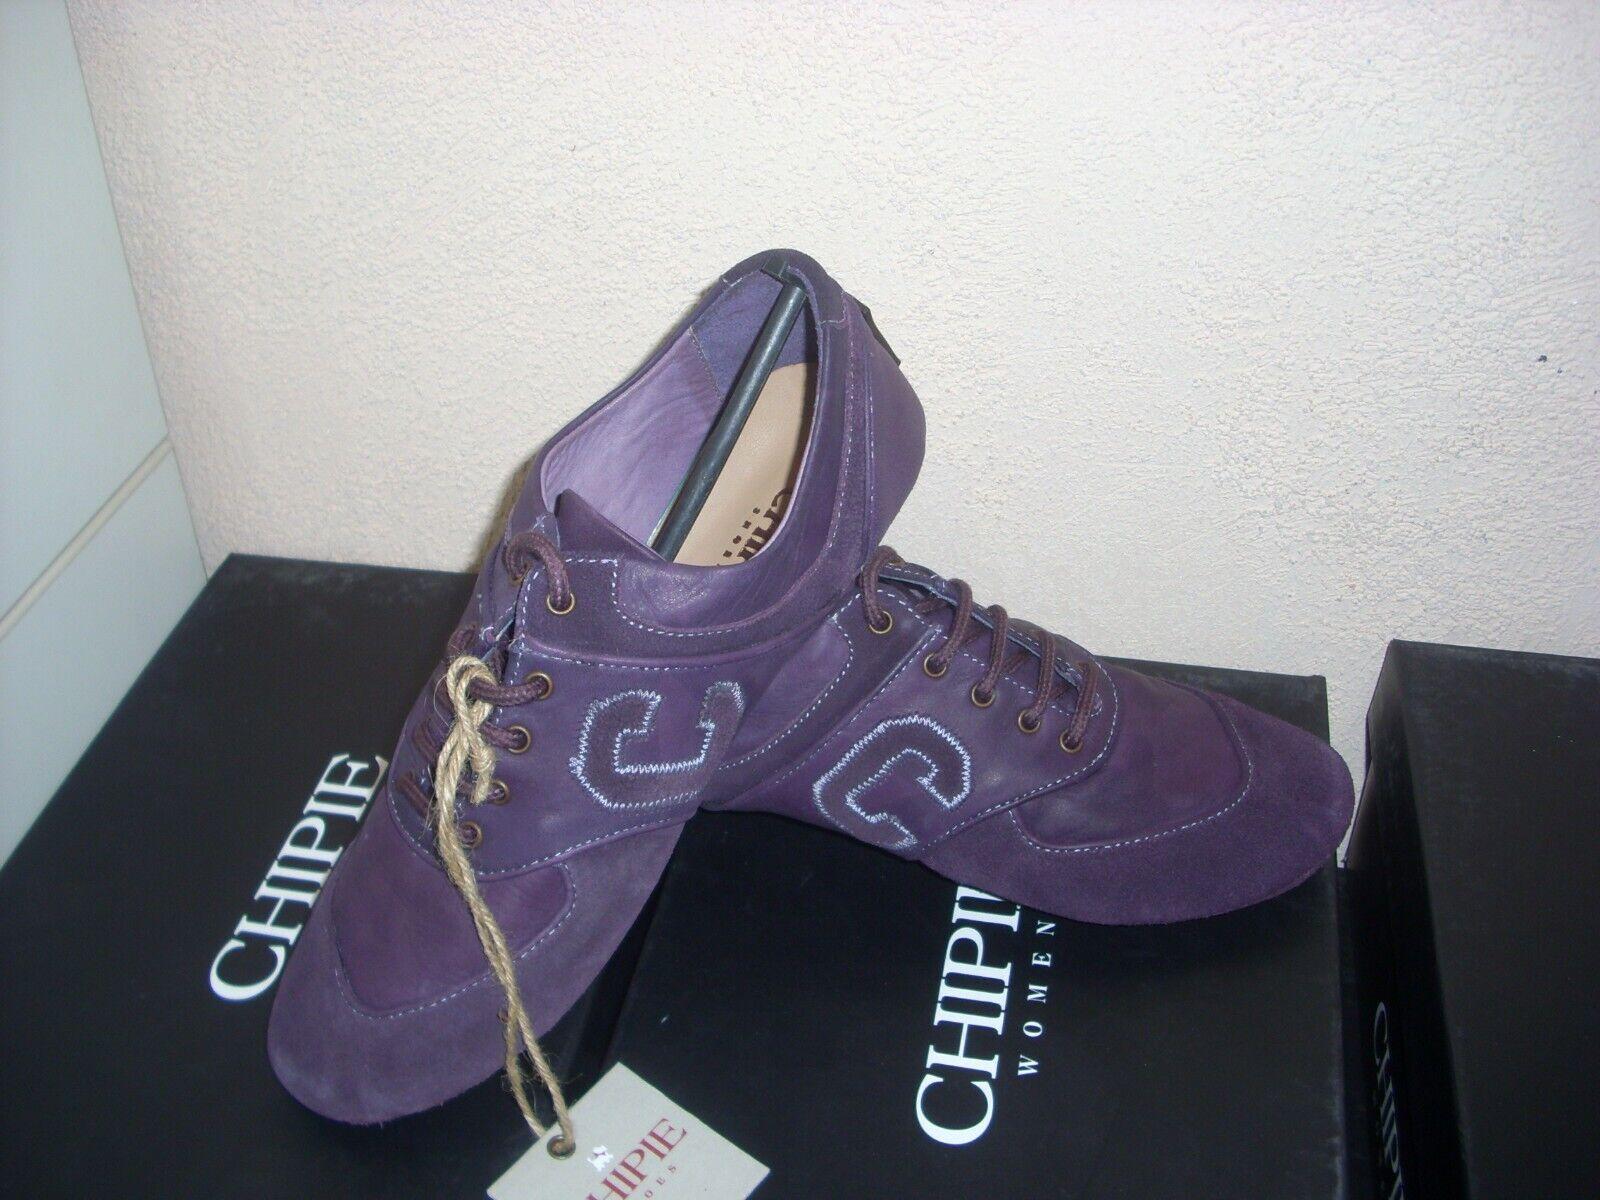 Chaussure mode femme CHIPIE neuve cuir bas prix pointure 36 RV